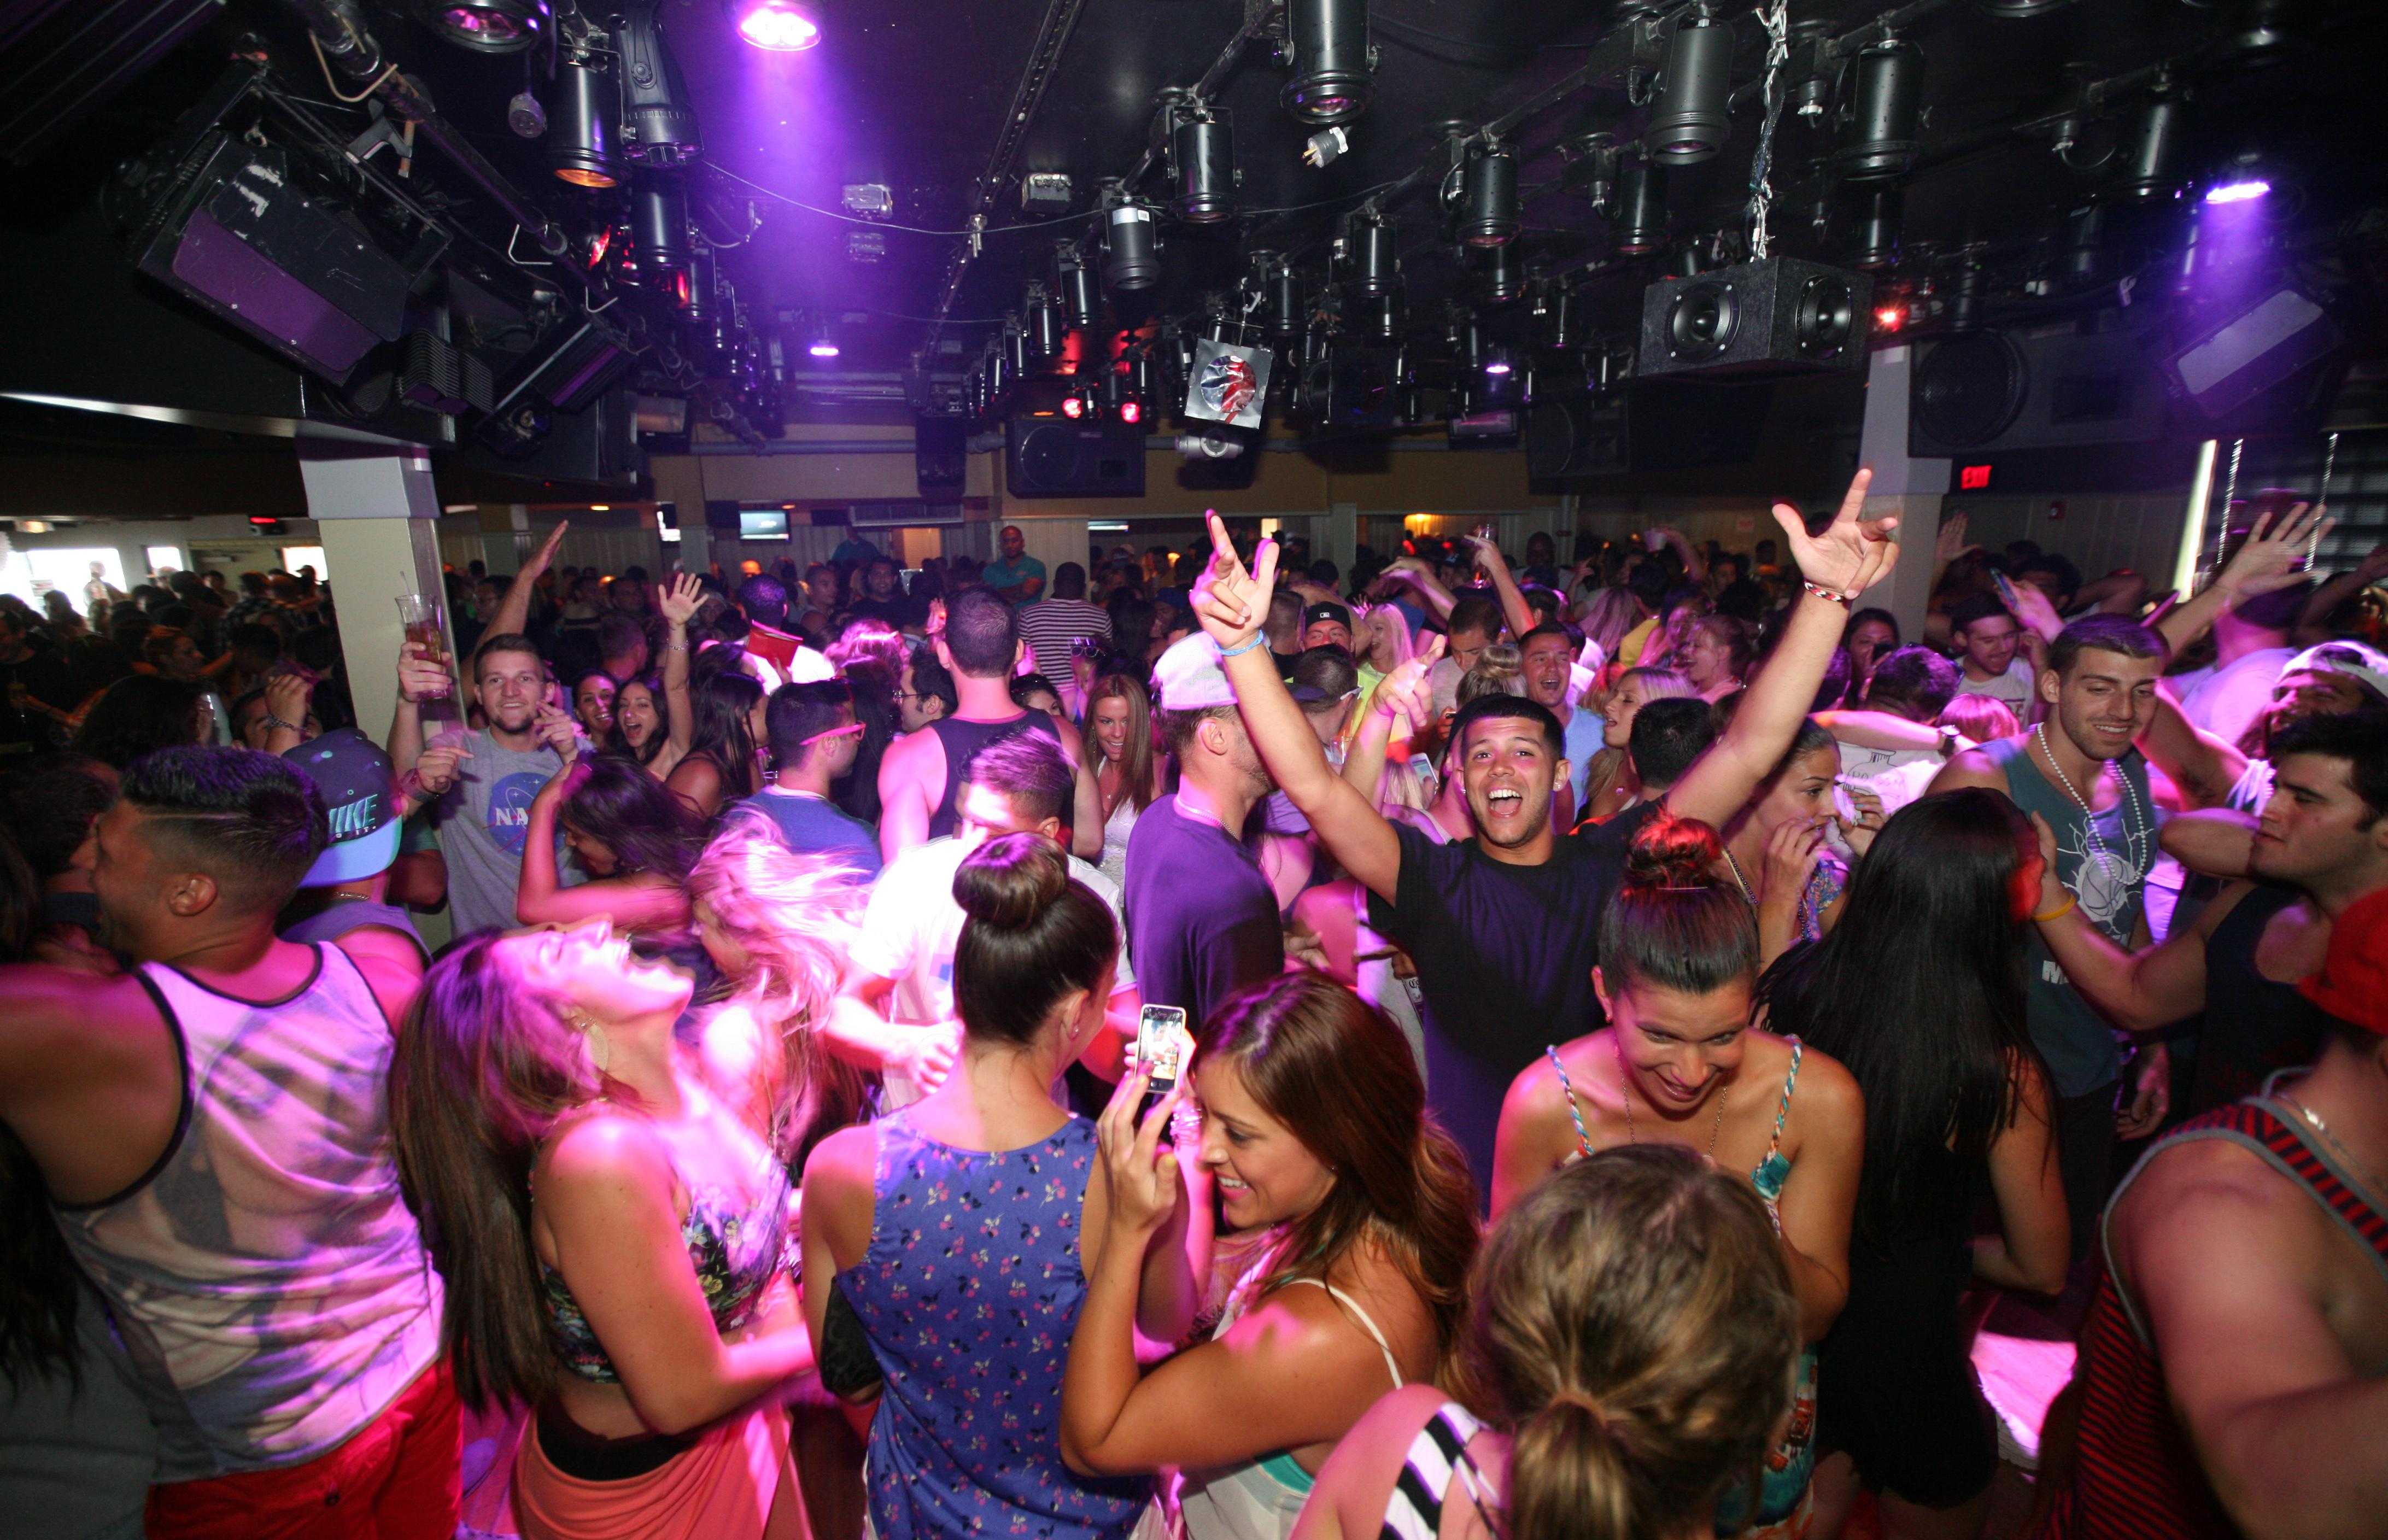 Jersey Shore nightlife waits in fear as coronavirus lingers. 'It's ...